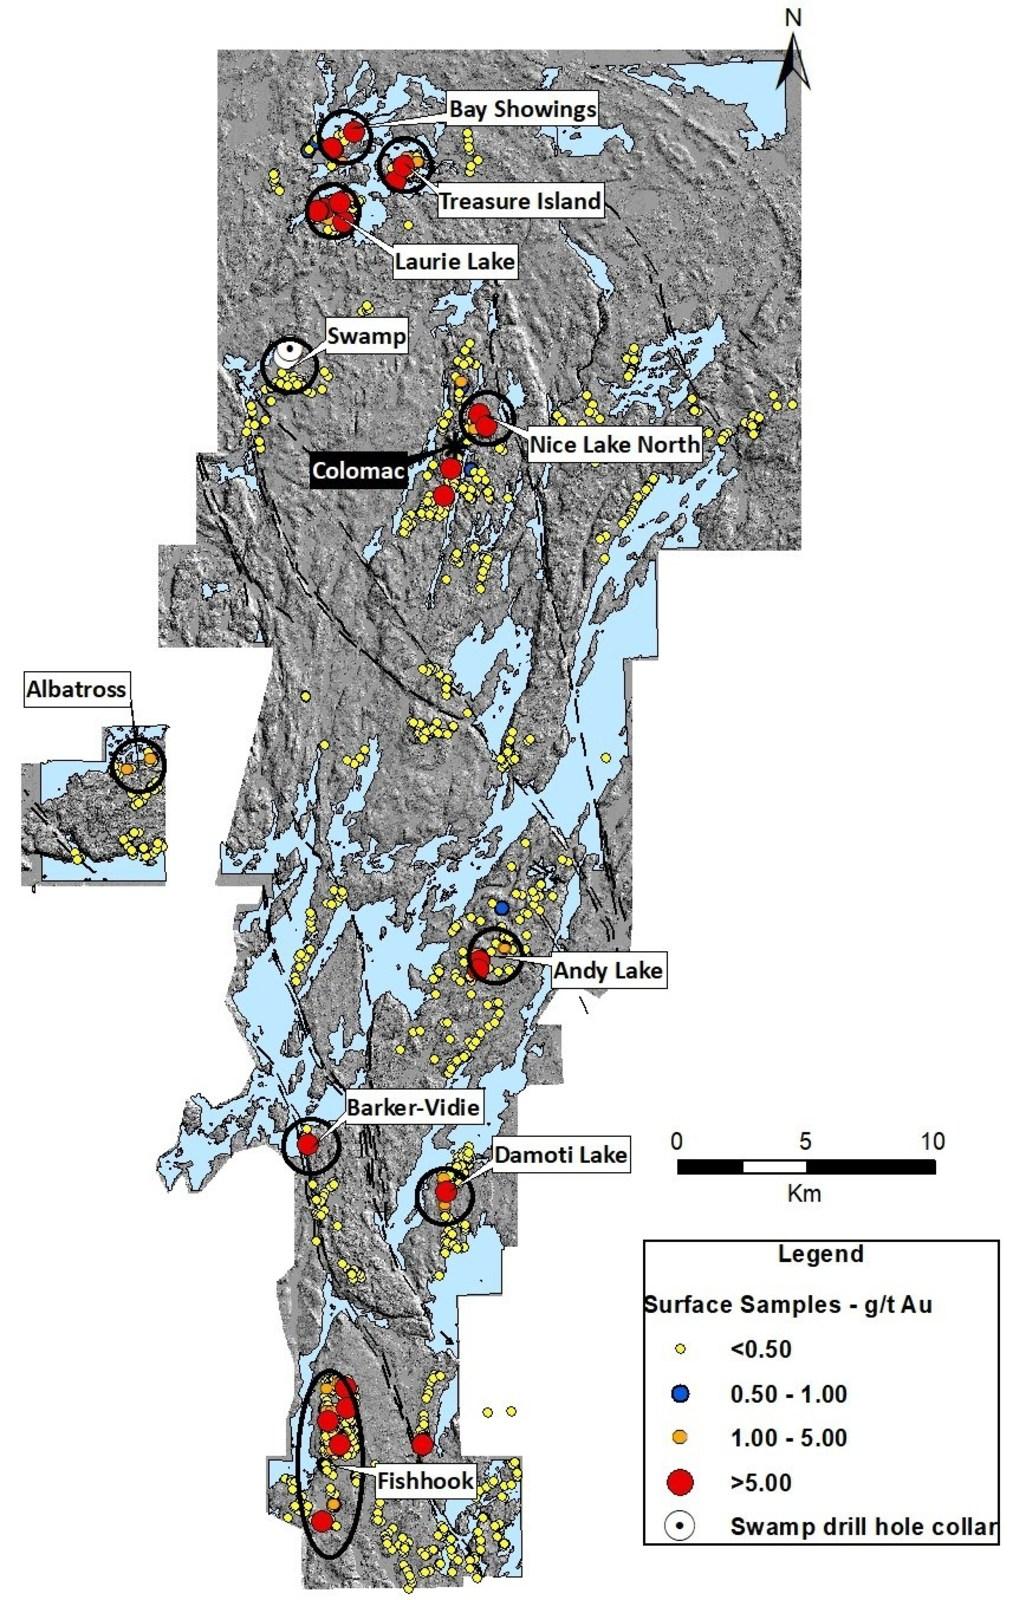 Figure 1. Indin Lake Gold Property – 2018 Field Program Top Prospects